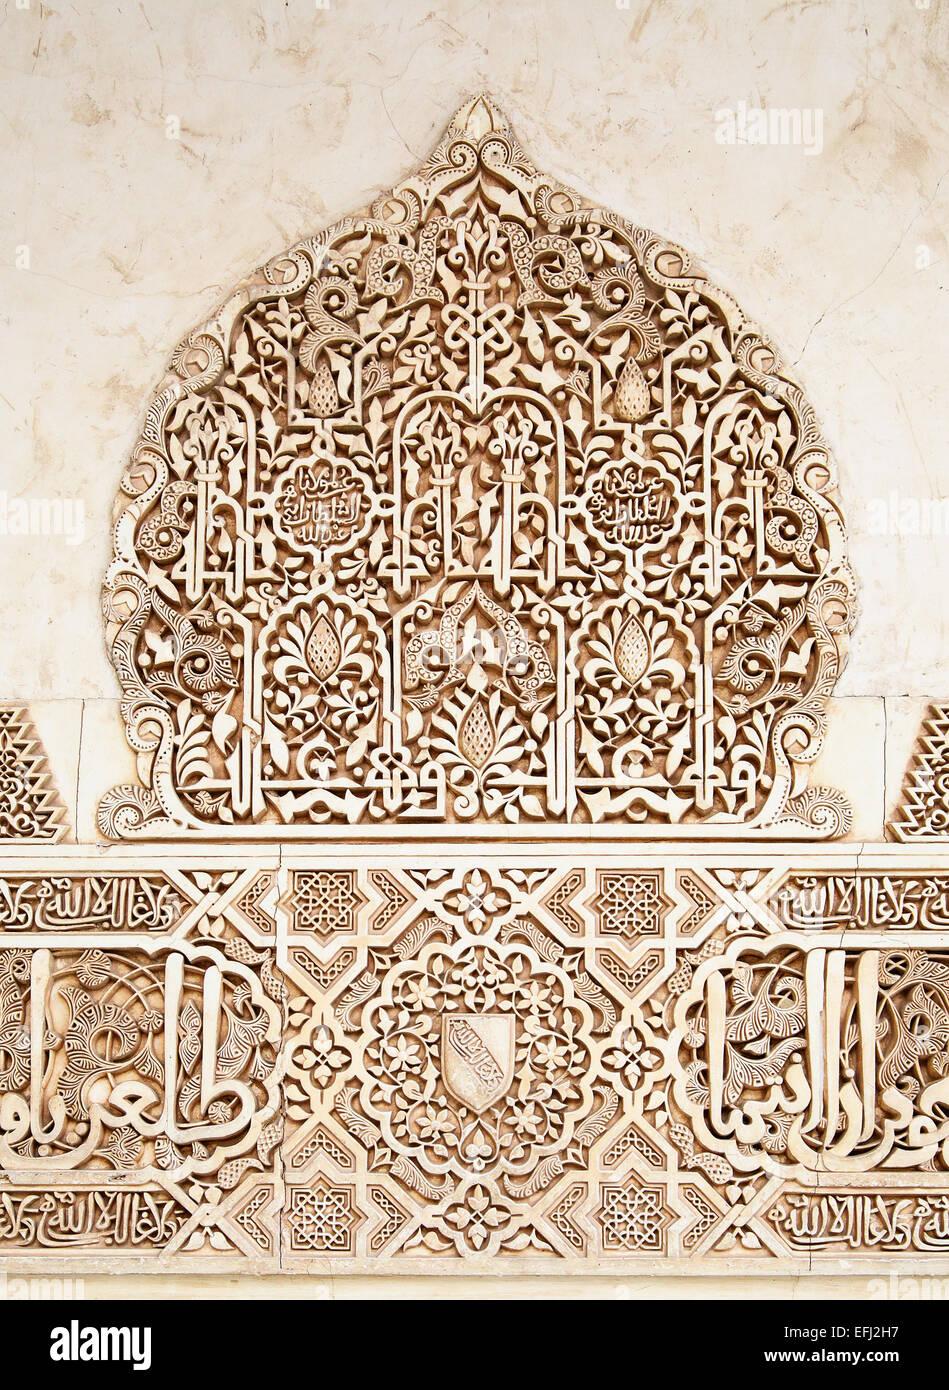 Arabesque in the Alhambra, Granada (14th century) - Stock Image